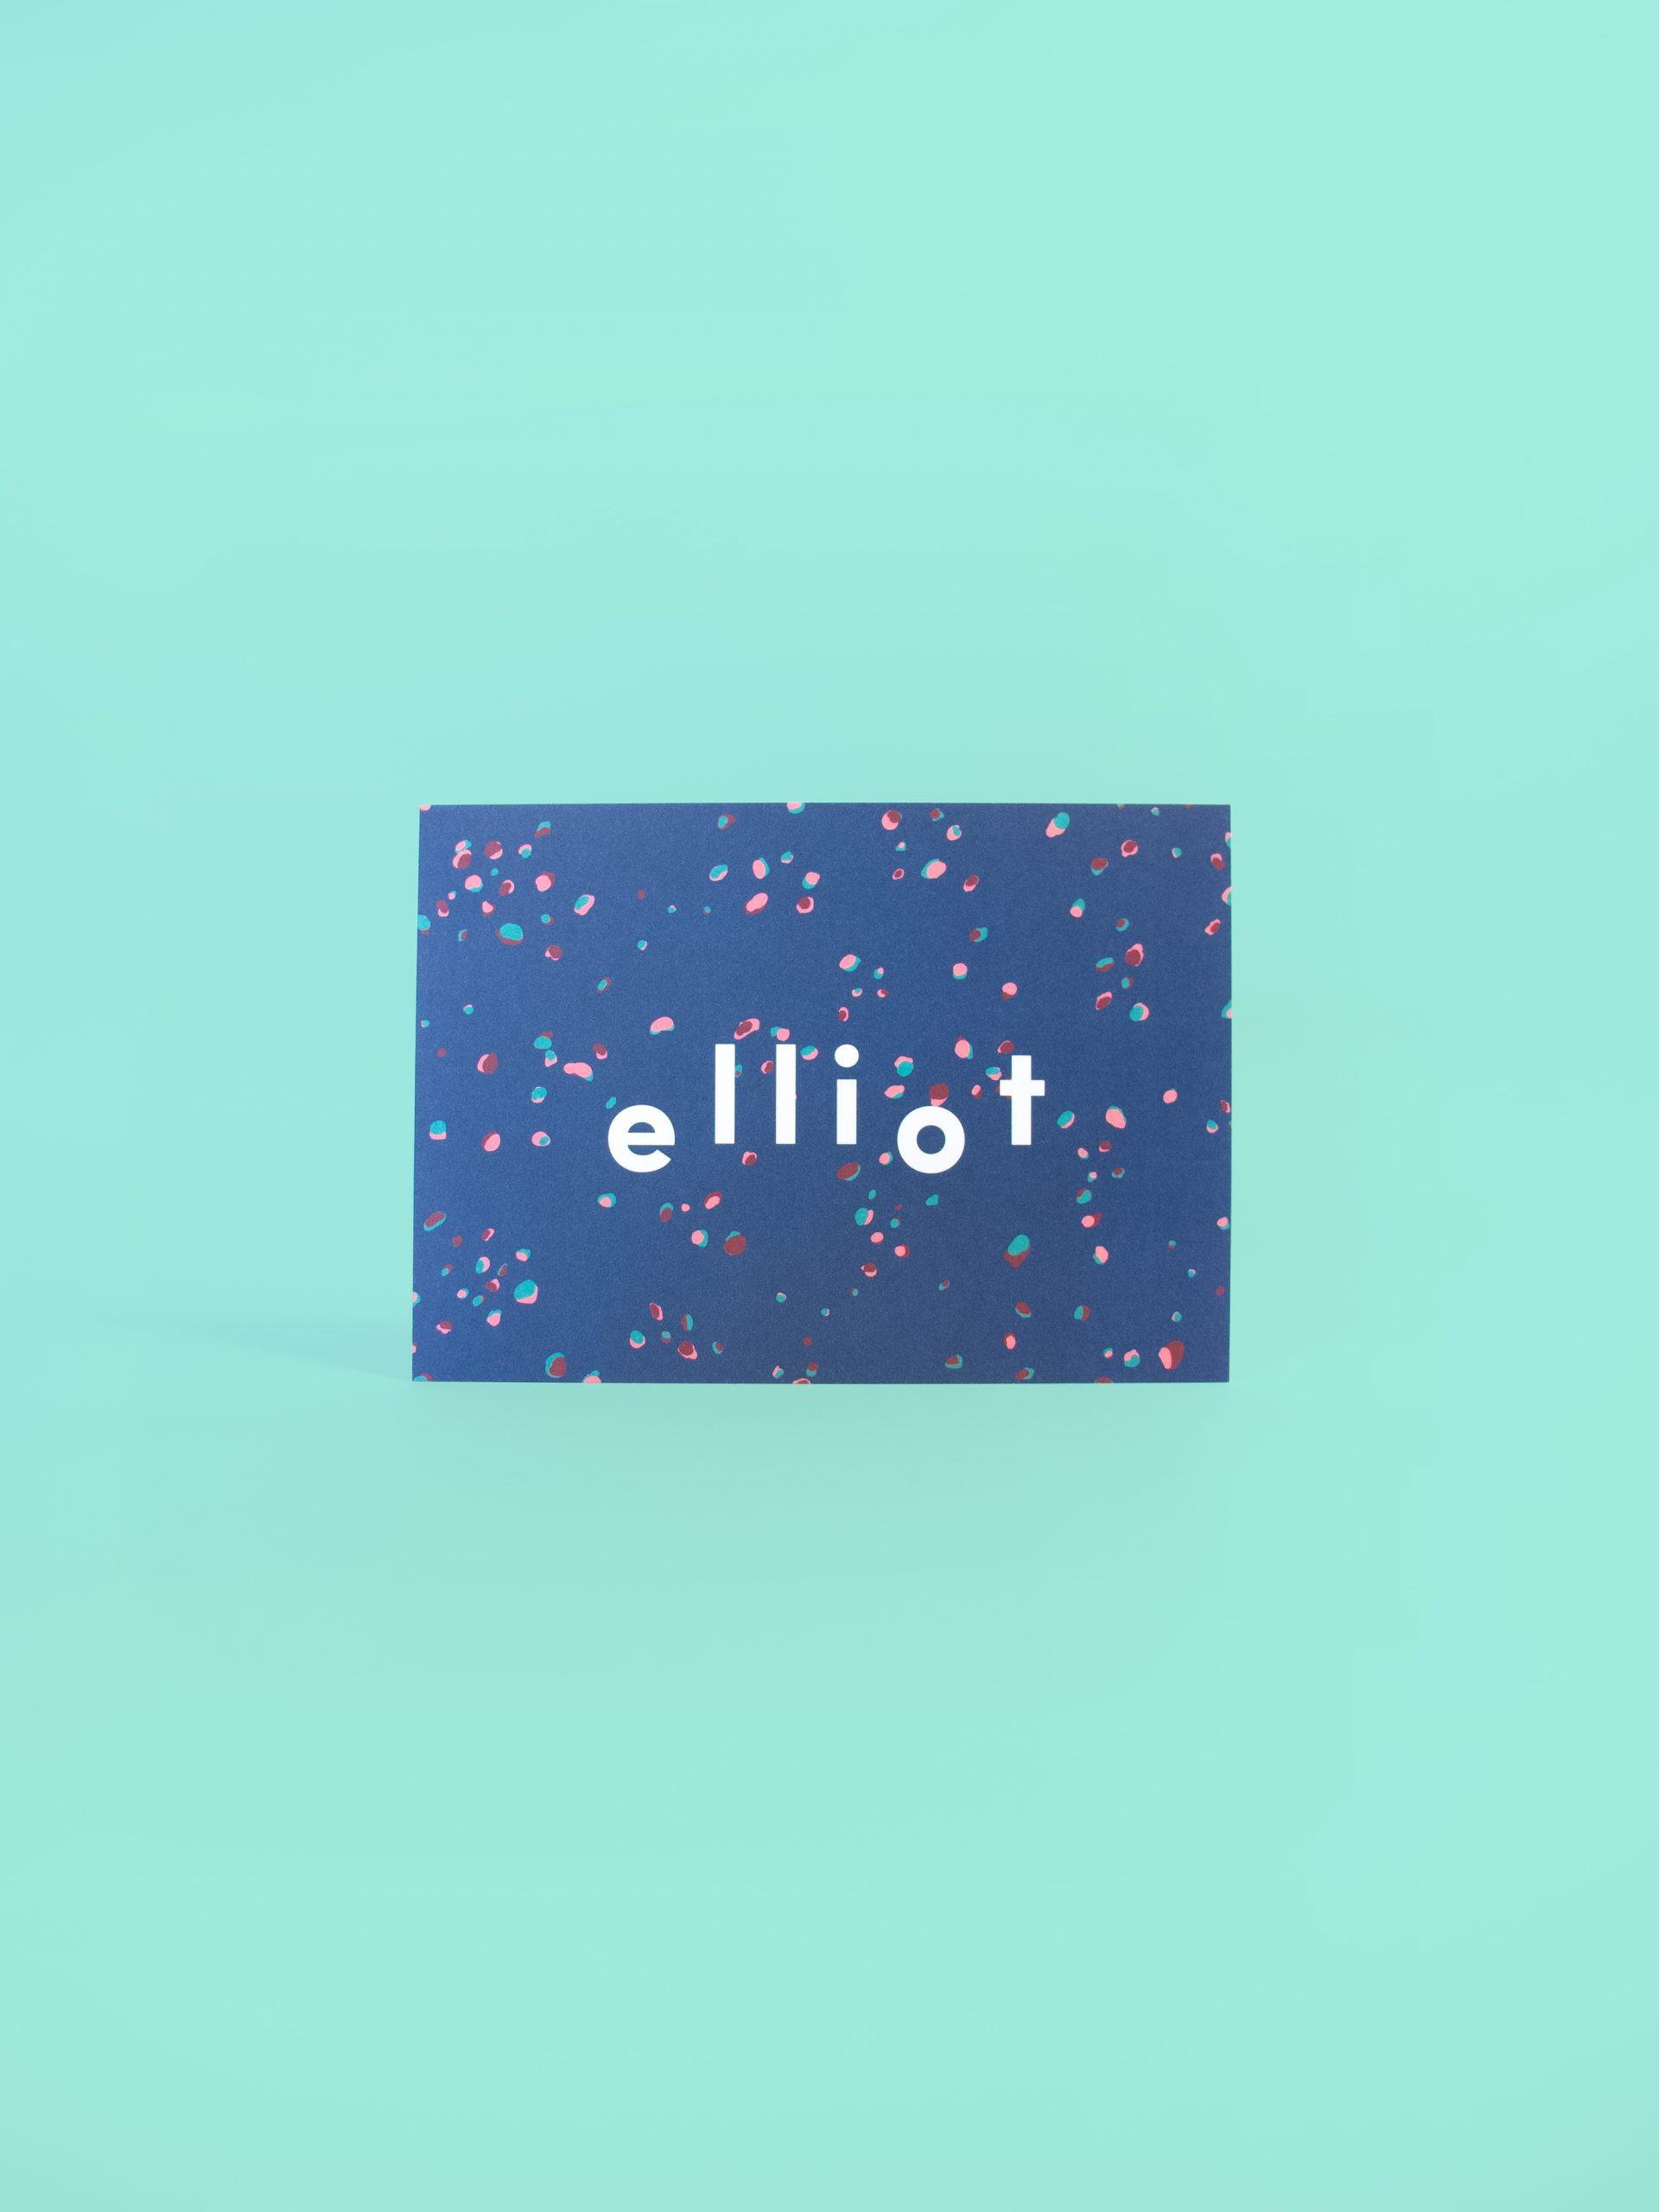 Elliot_1